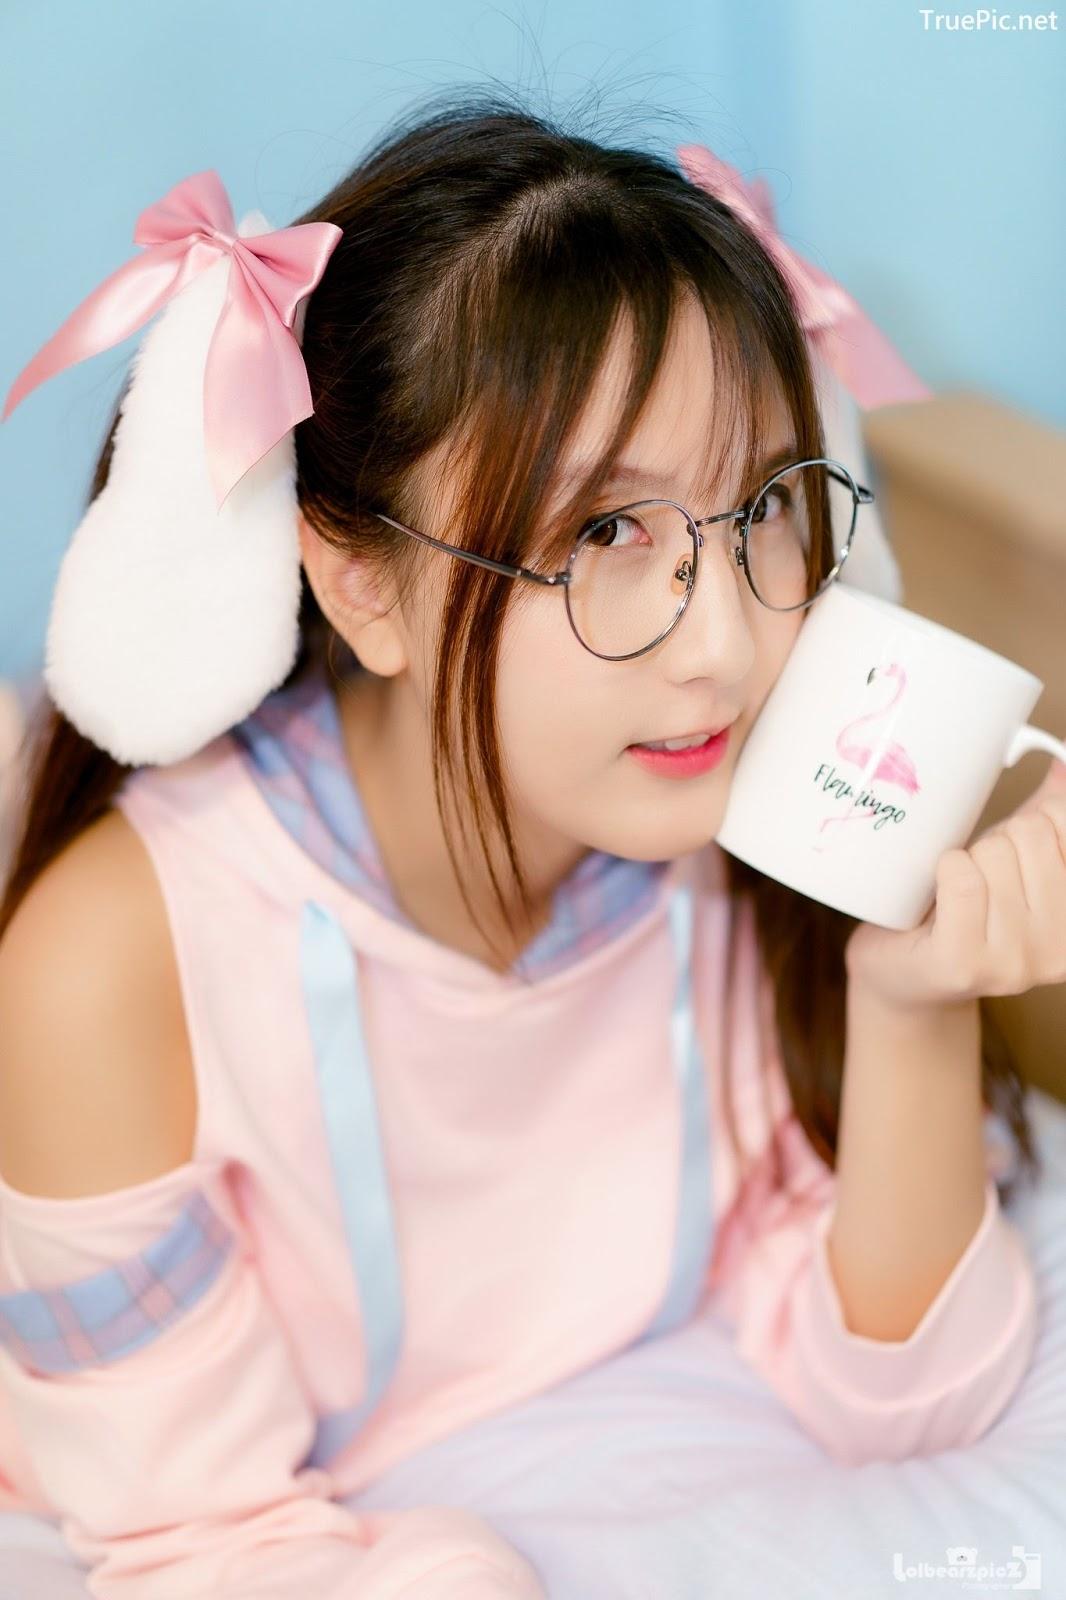 Image Thailand Model - Phunnita Intarapimai - Cute Rabbit Girl - TruePic.net - Picture-7